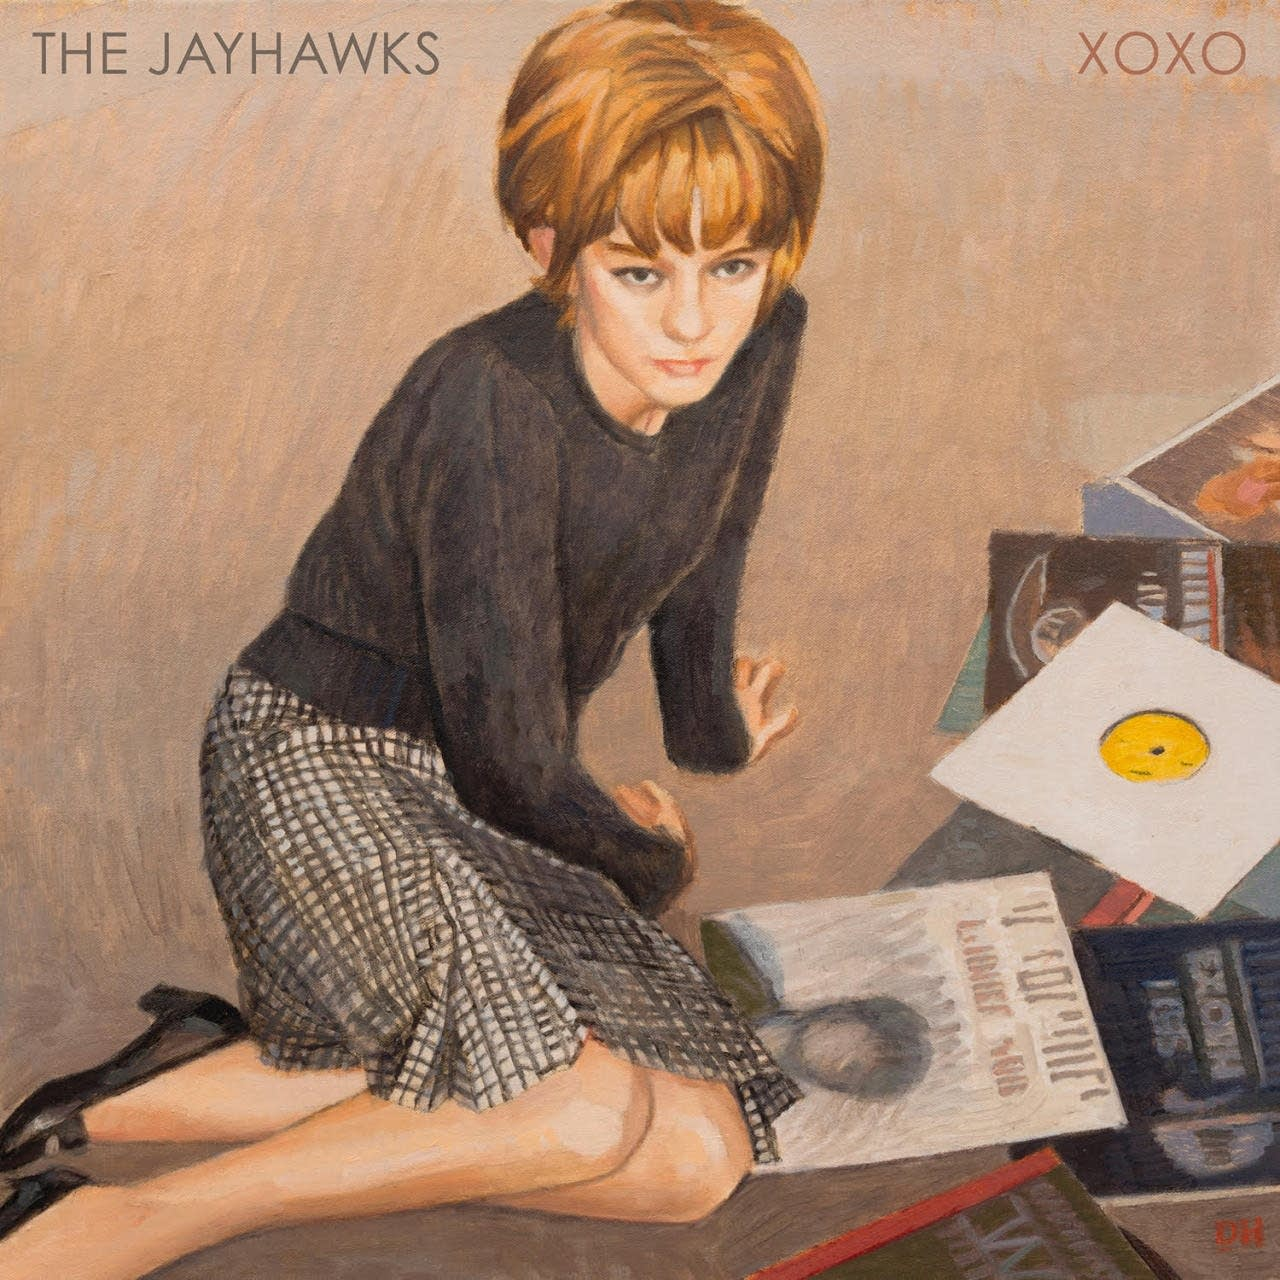 The Jayhawks, 'XOXO'